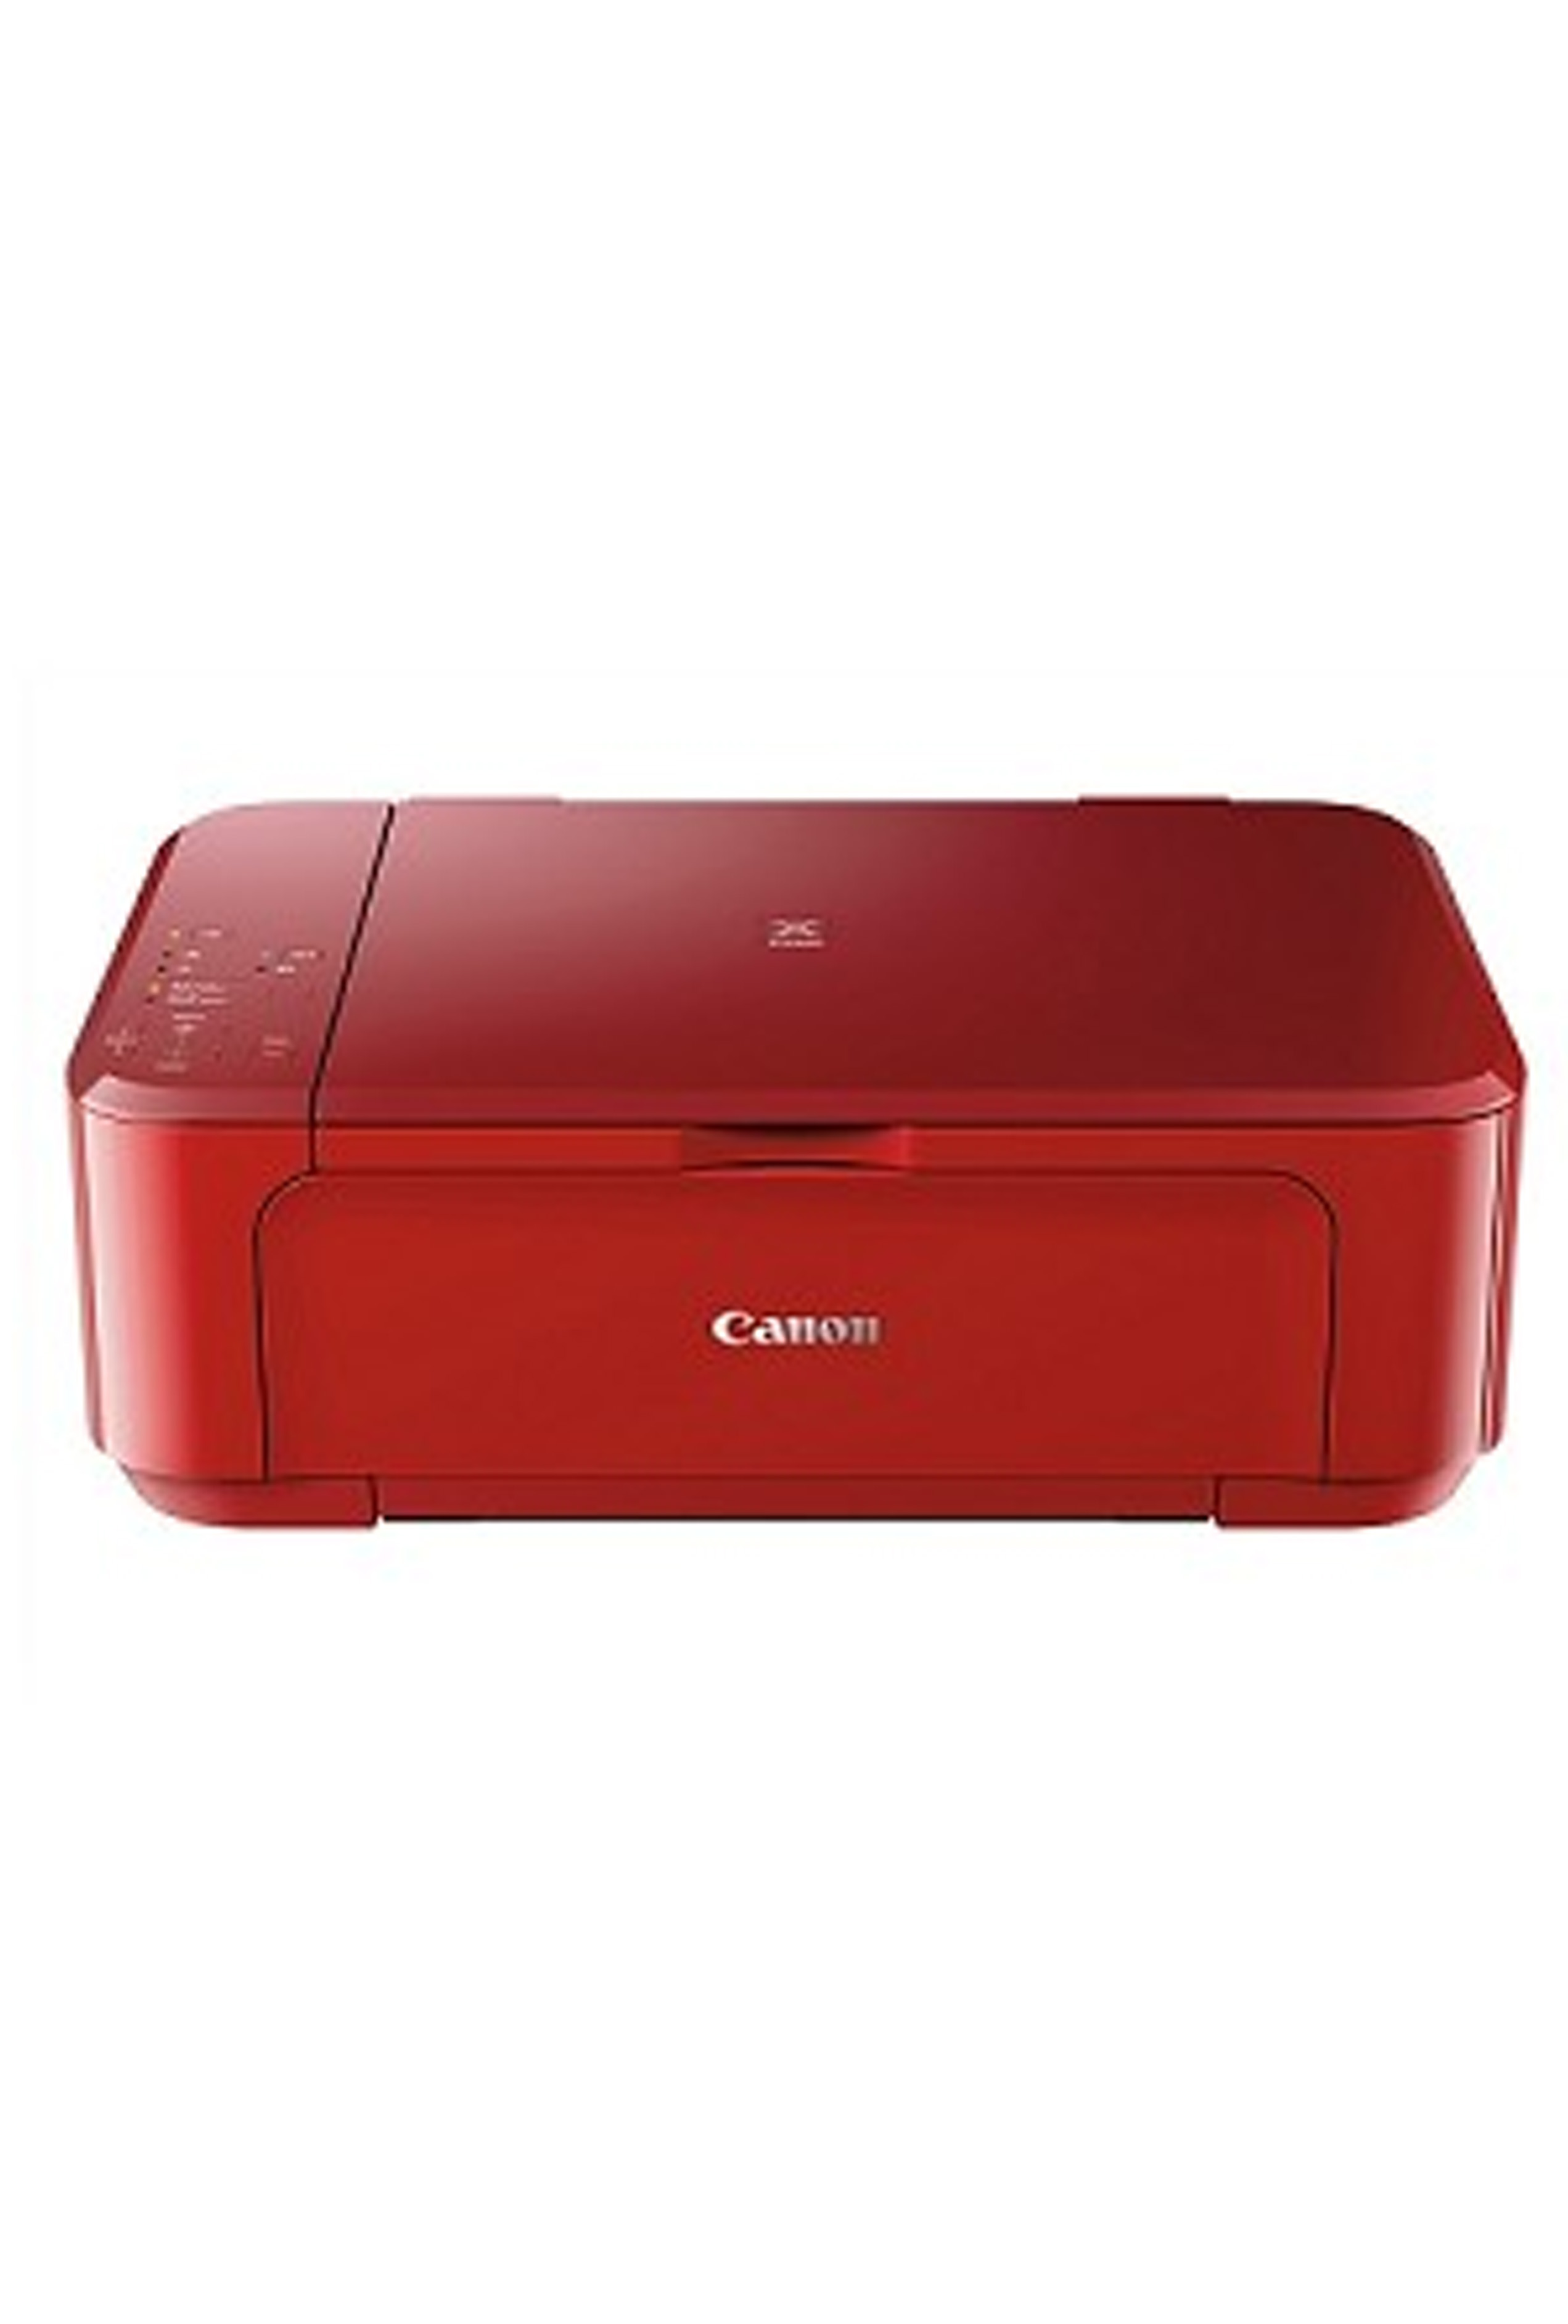 Canon PIXMA MG3620 Red Wireless...